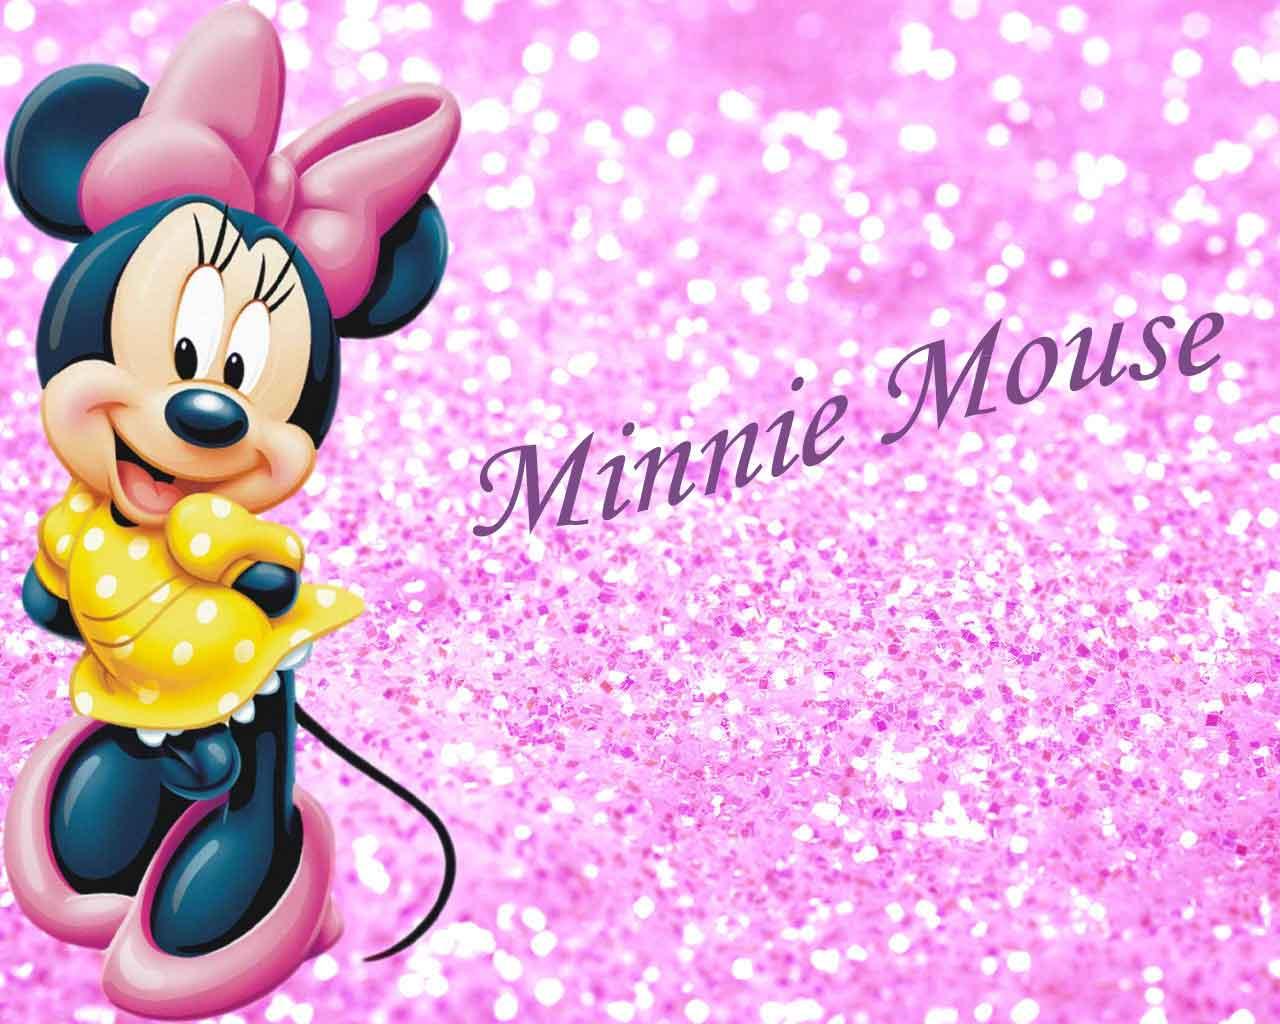 Minnie mouse 6045 1280x1024 px - Fondos de minnie mouse ...